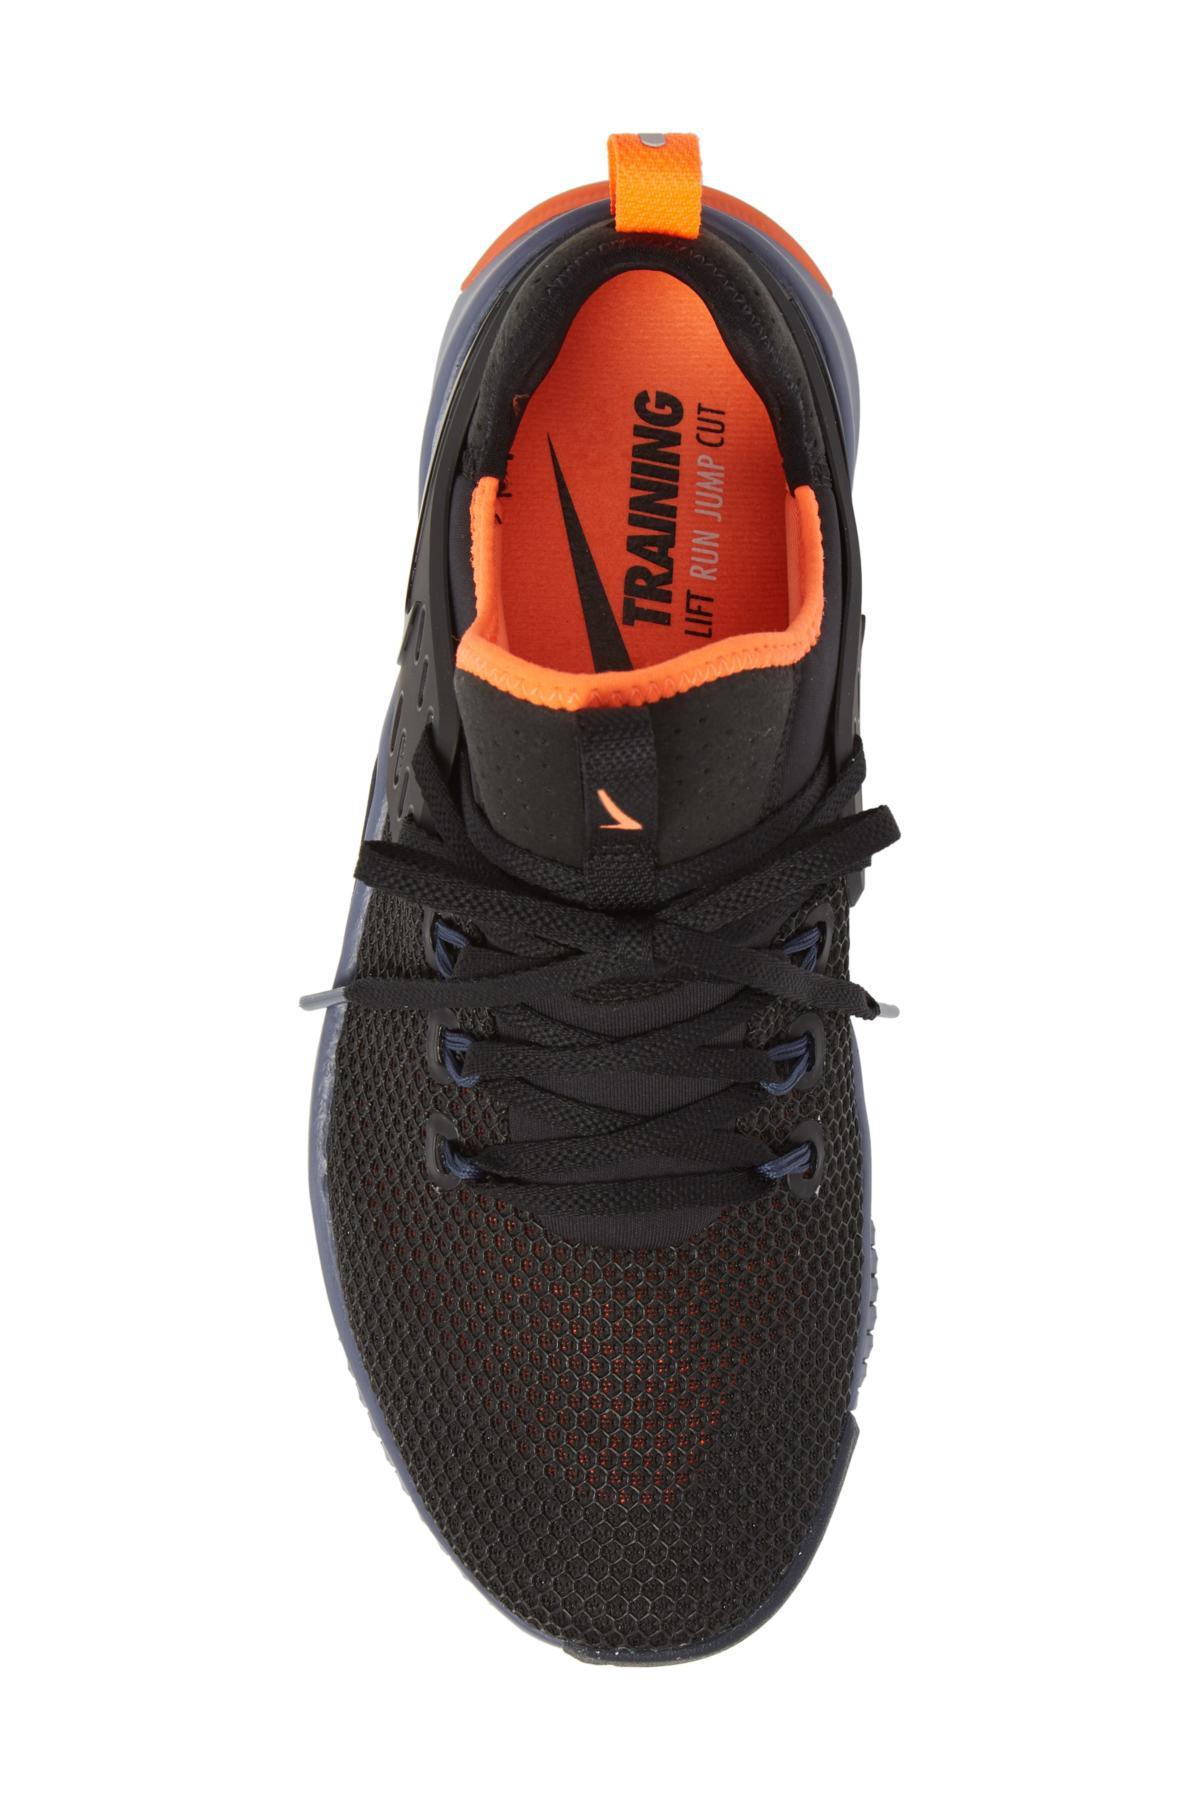 a0322ed08 nike-BLACKTHUNBL-48-Free-X-Metcon-Training-Shoe-men.jpeg